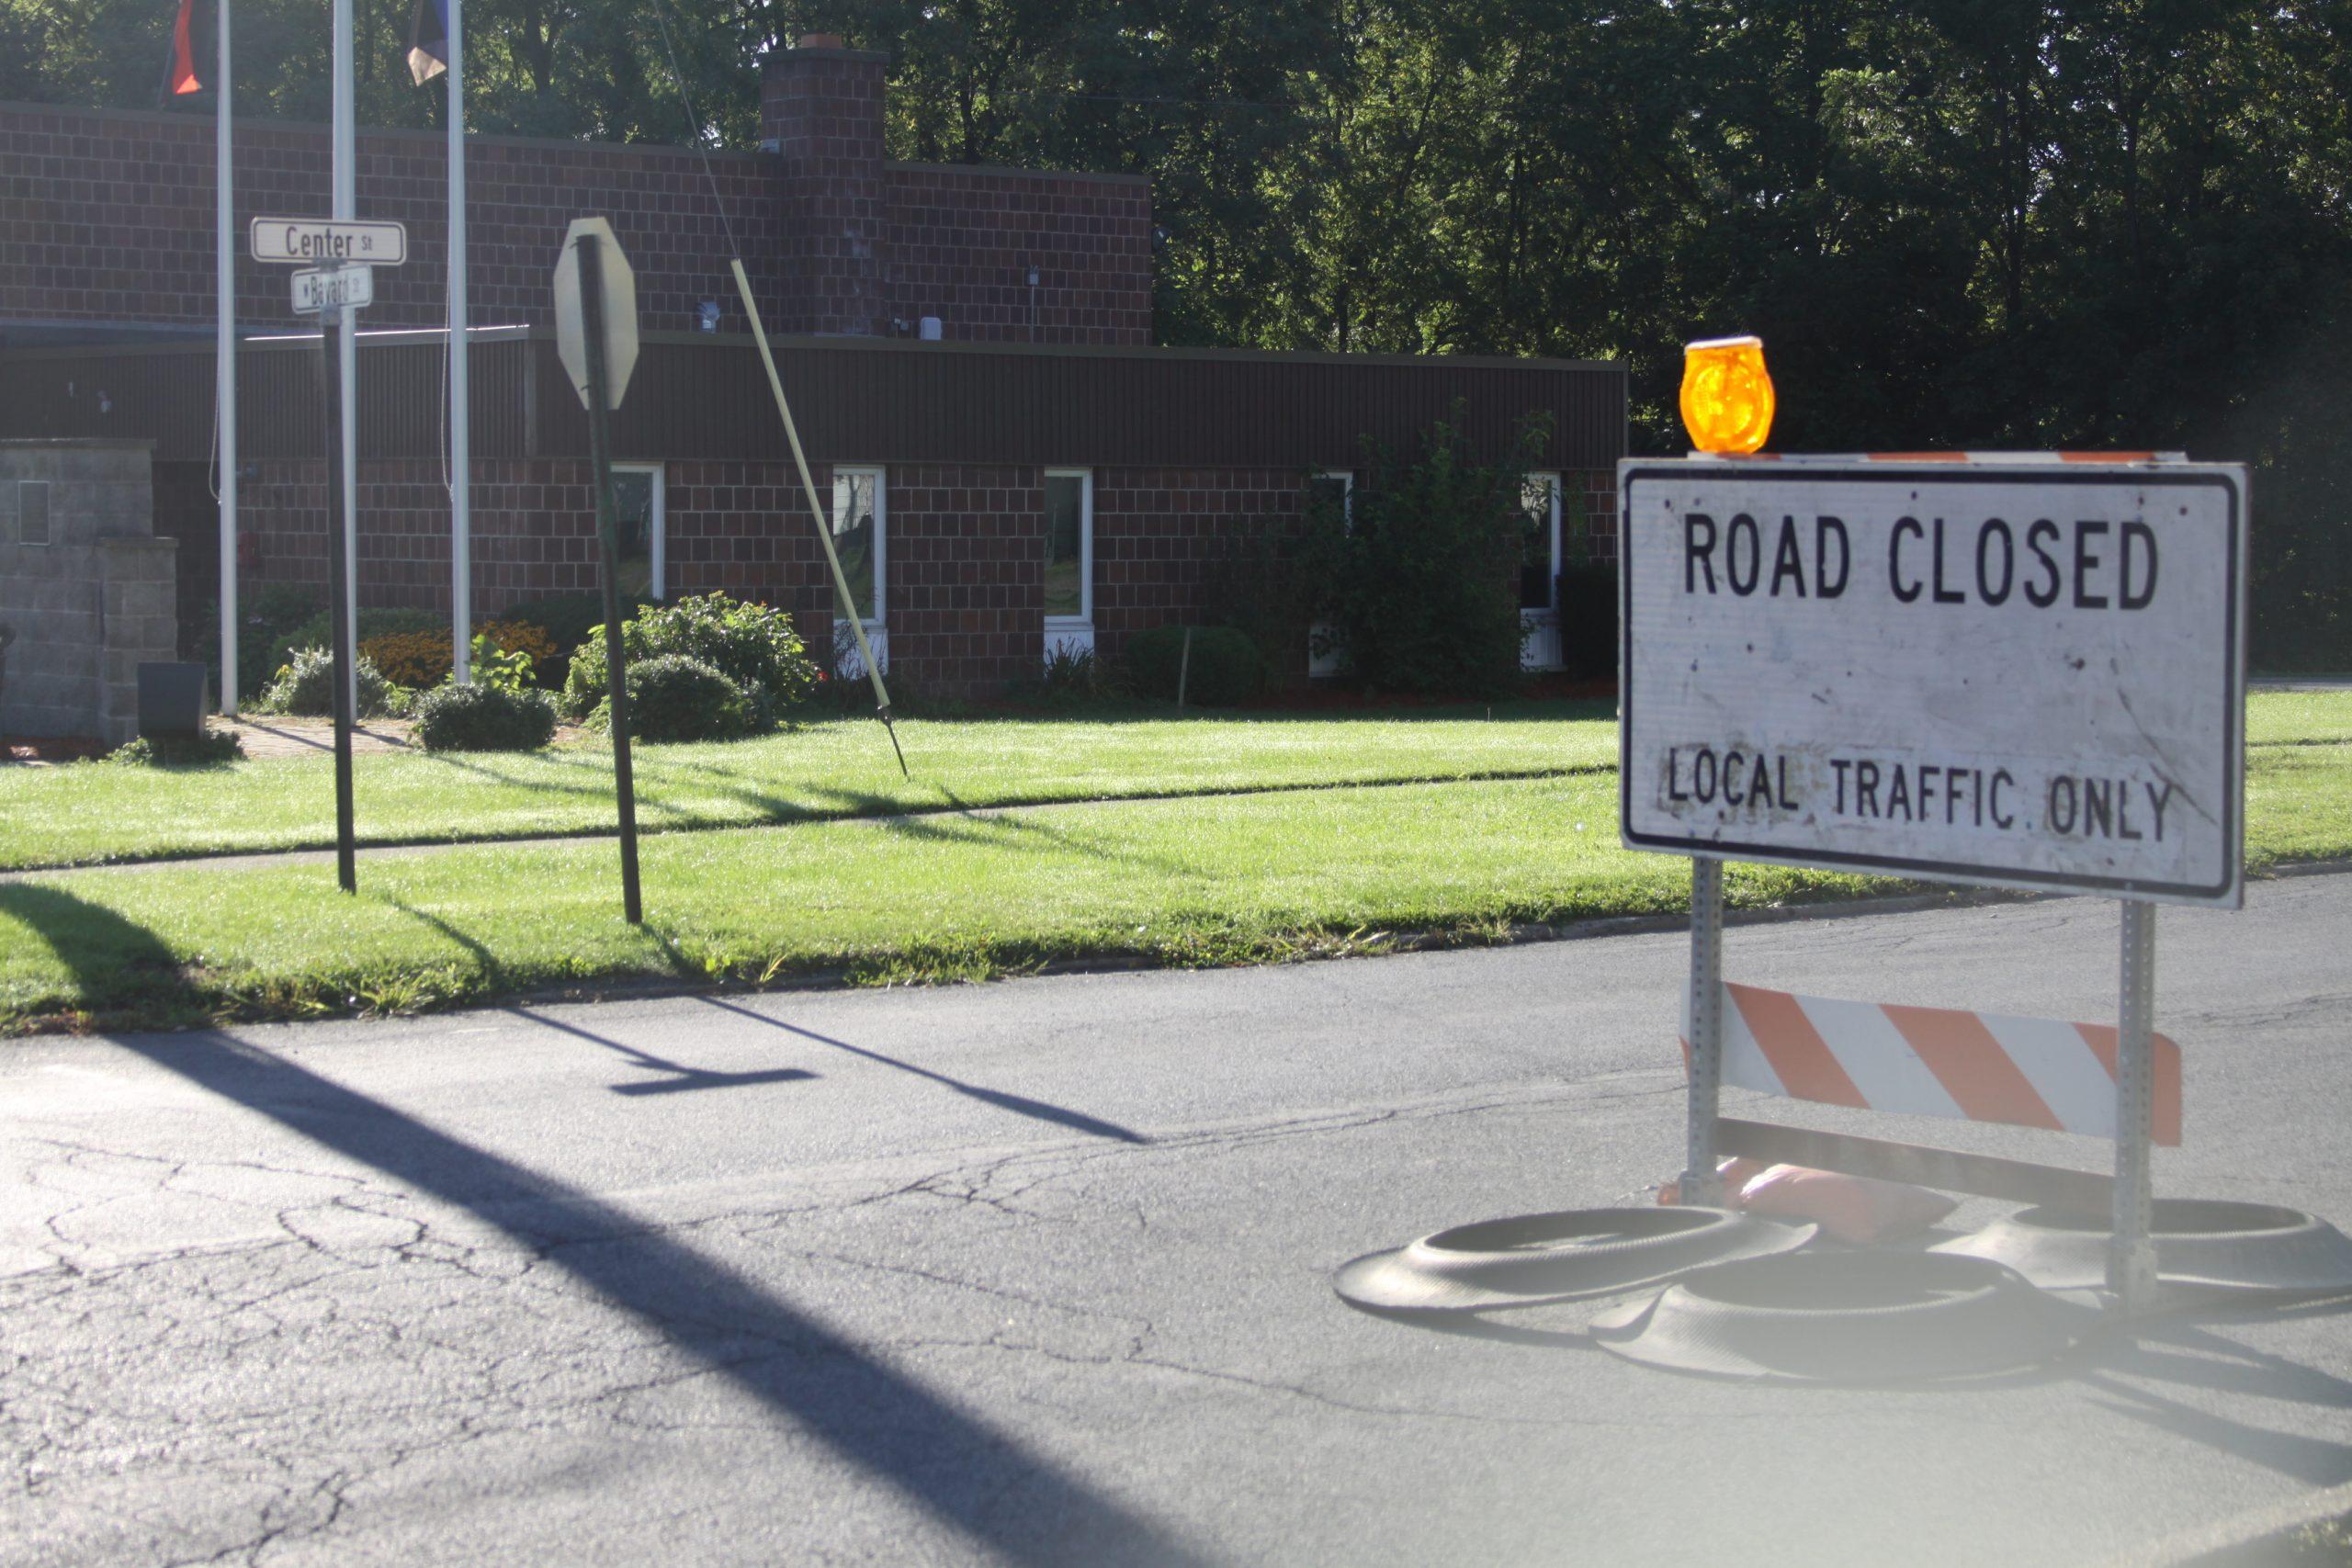 W. Bayard St. culvert repairs could cost around $1.5M to get traffic flowing in Seneca Falls